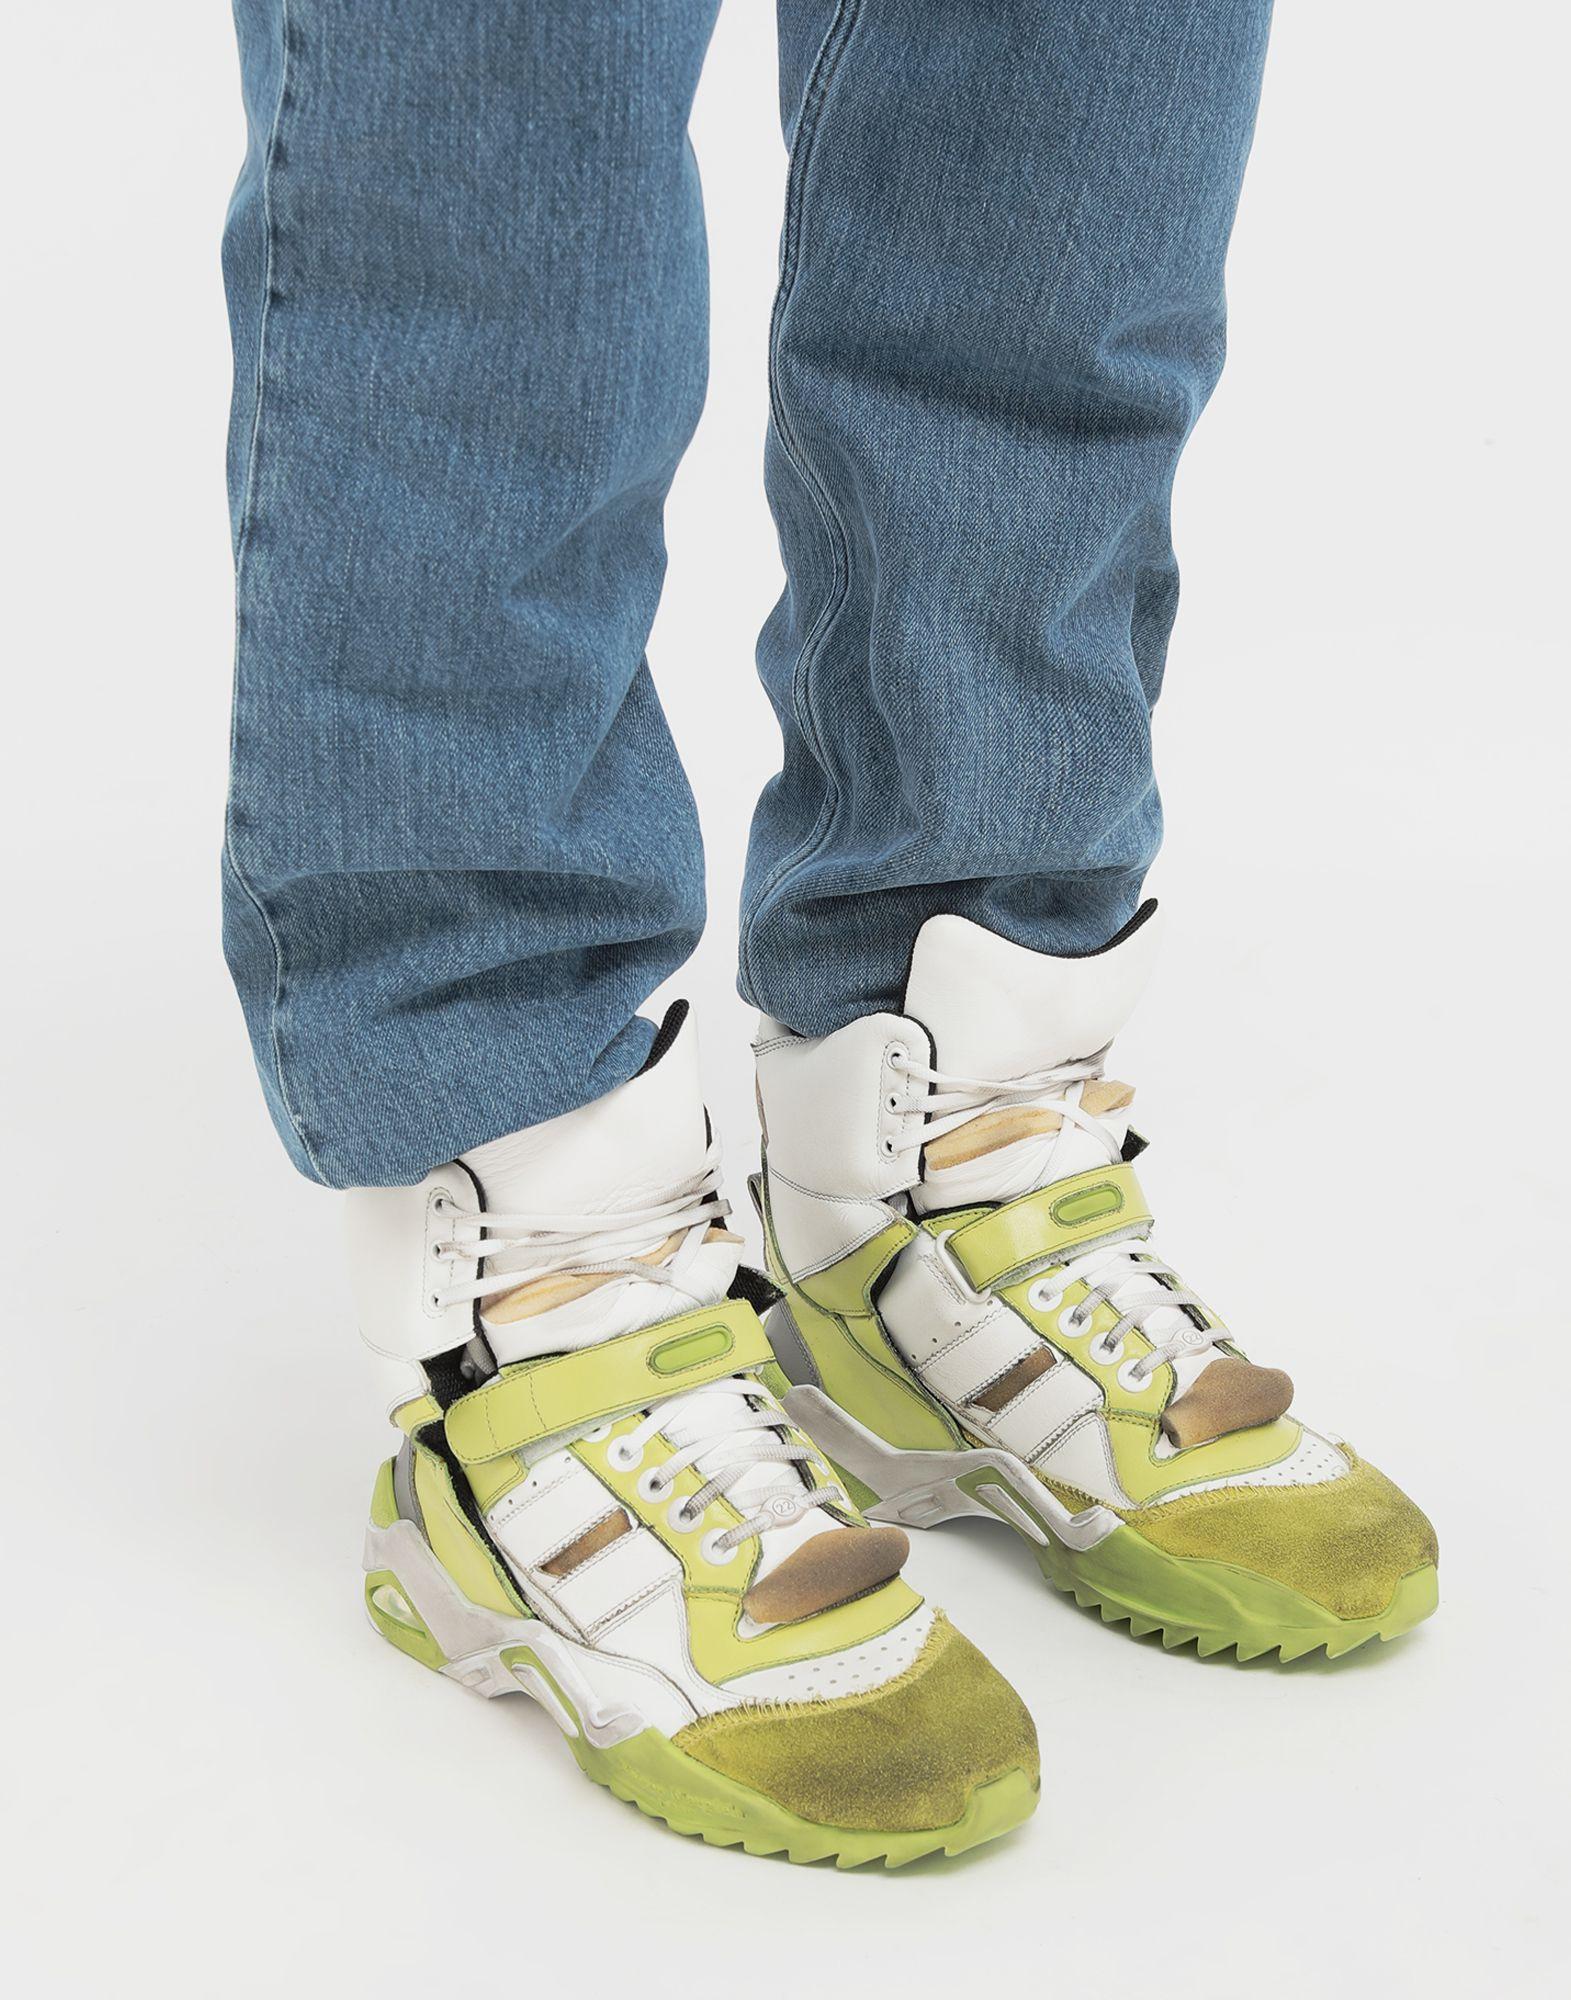 MAISON MARGIELA High-Top-Sneakers Retro Fit Sneakers Herr b